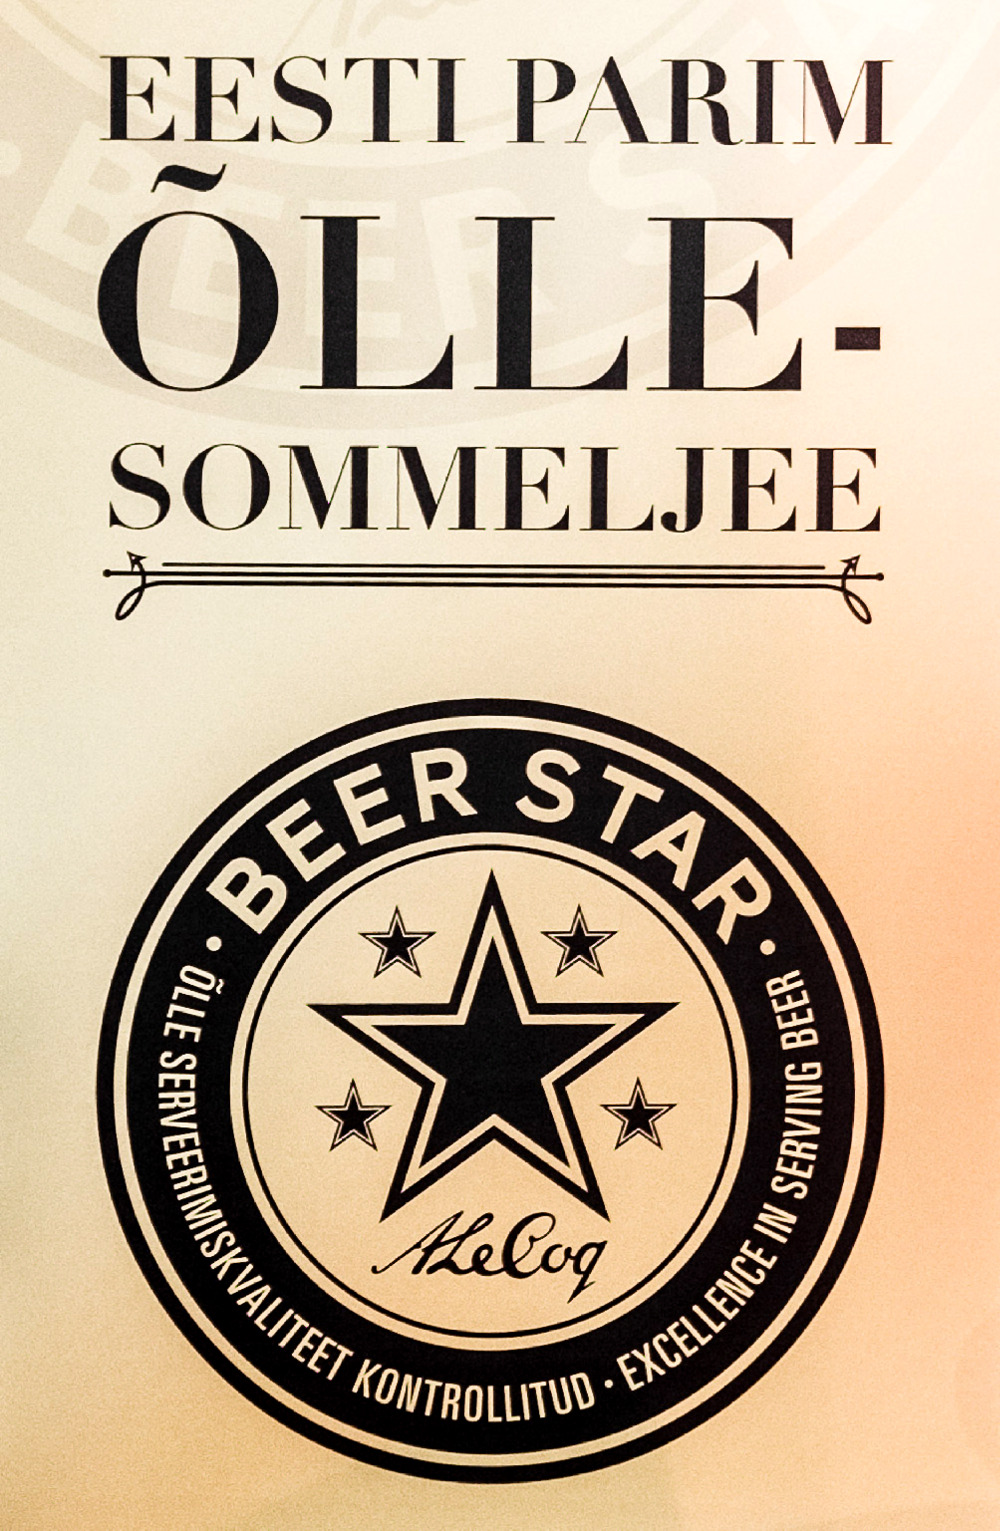 Beer Star — эстонский конкурс сомелье пива